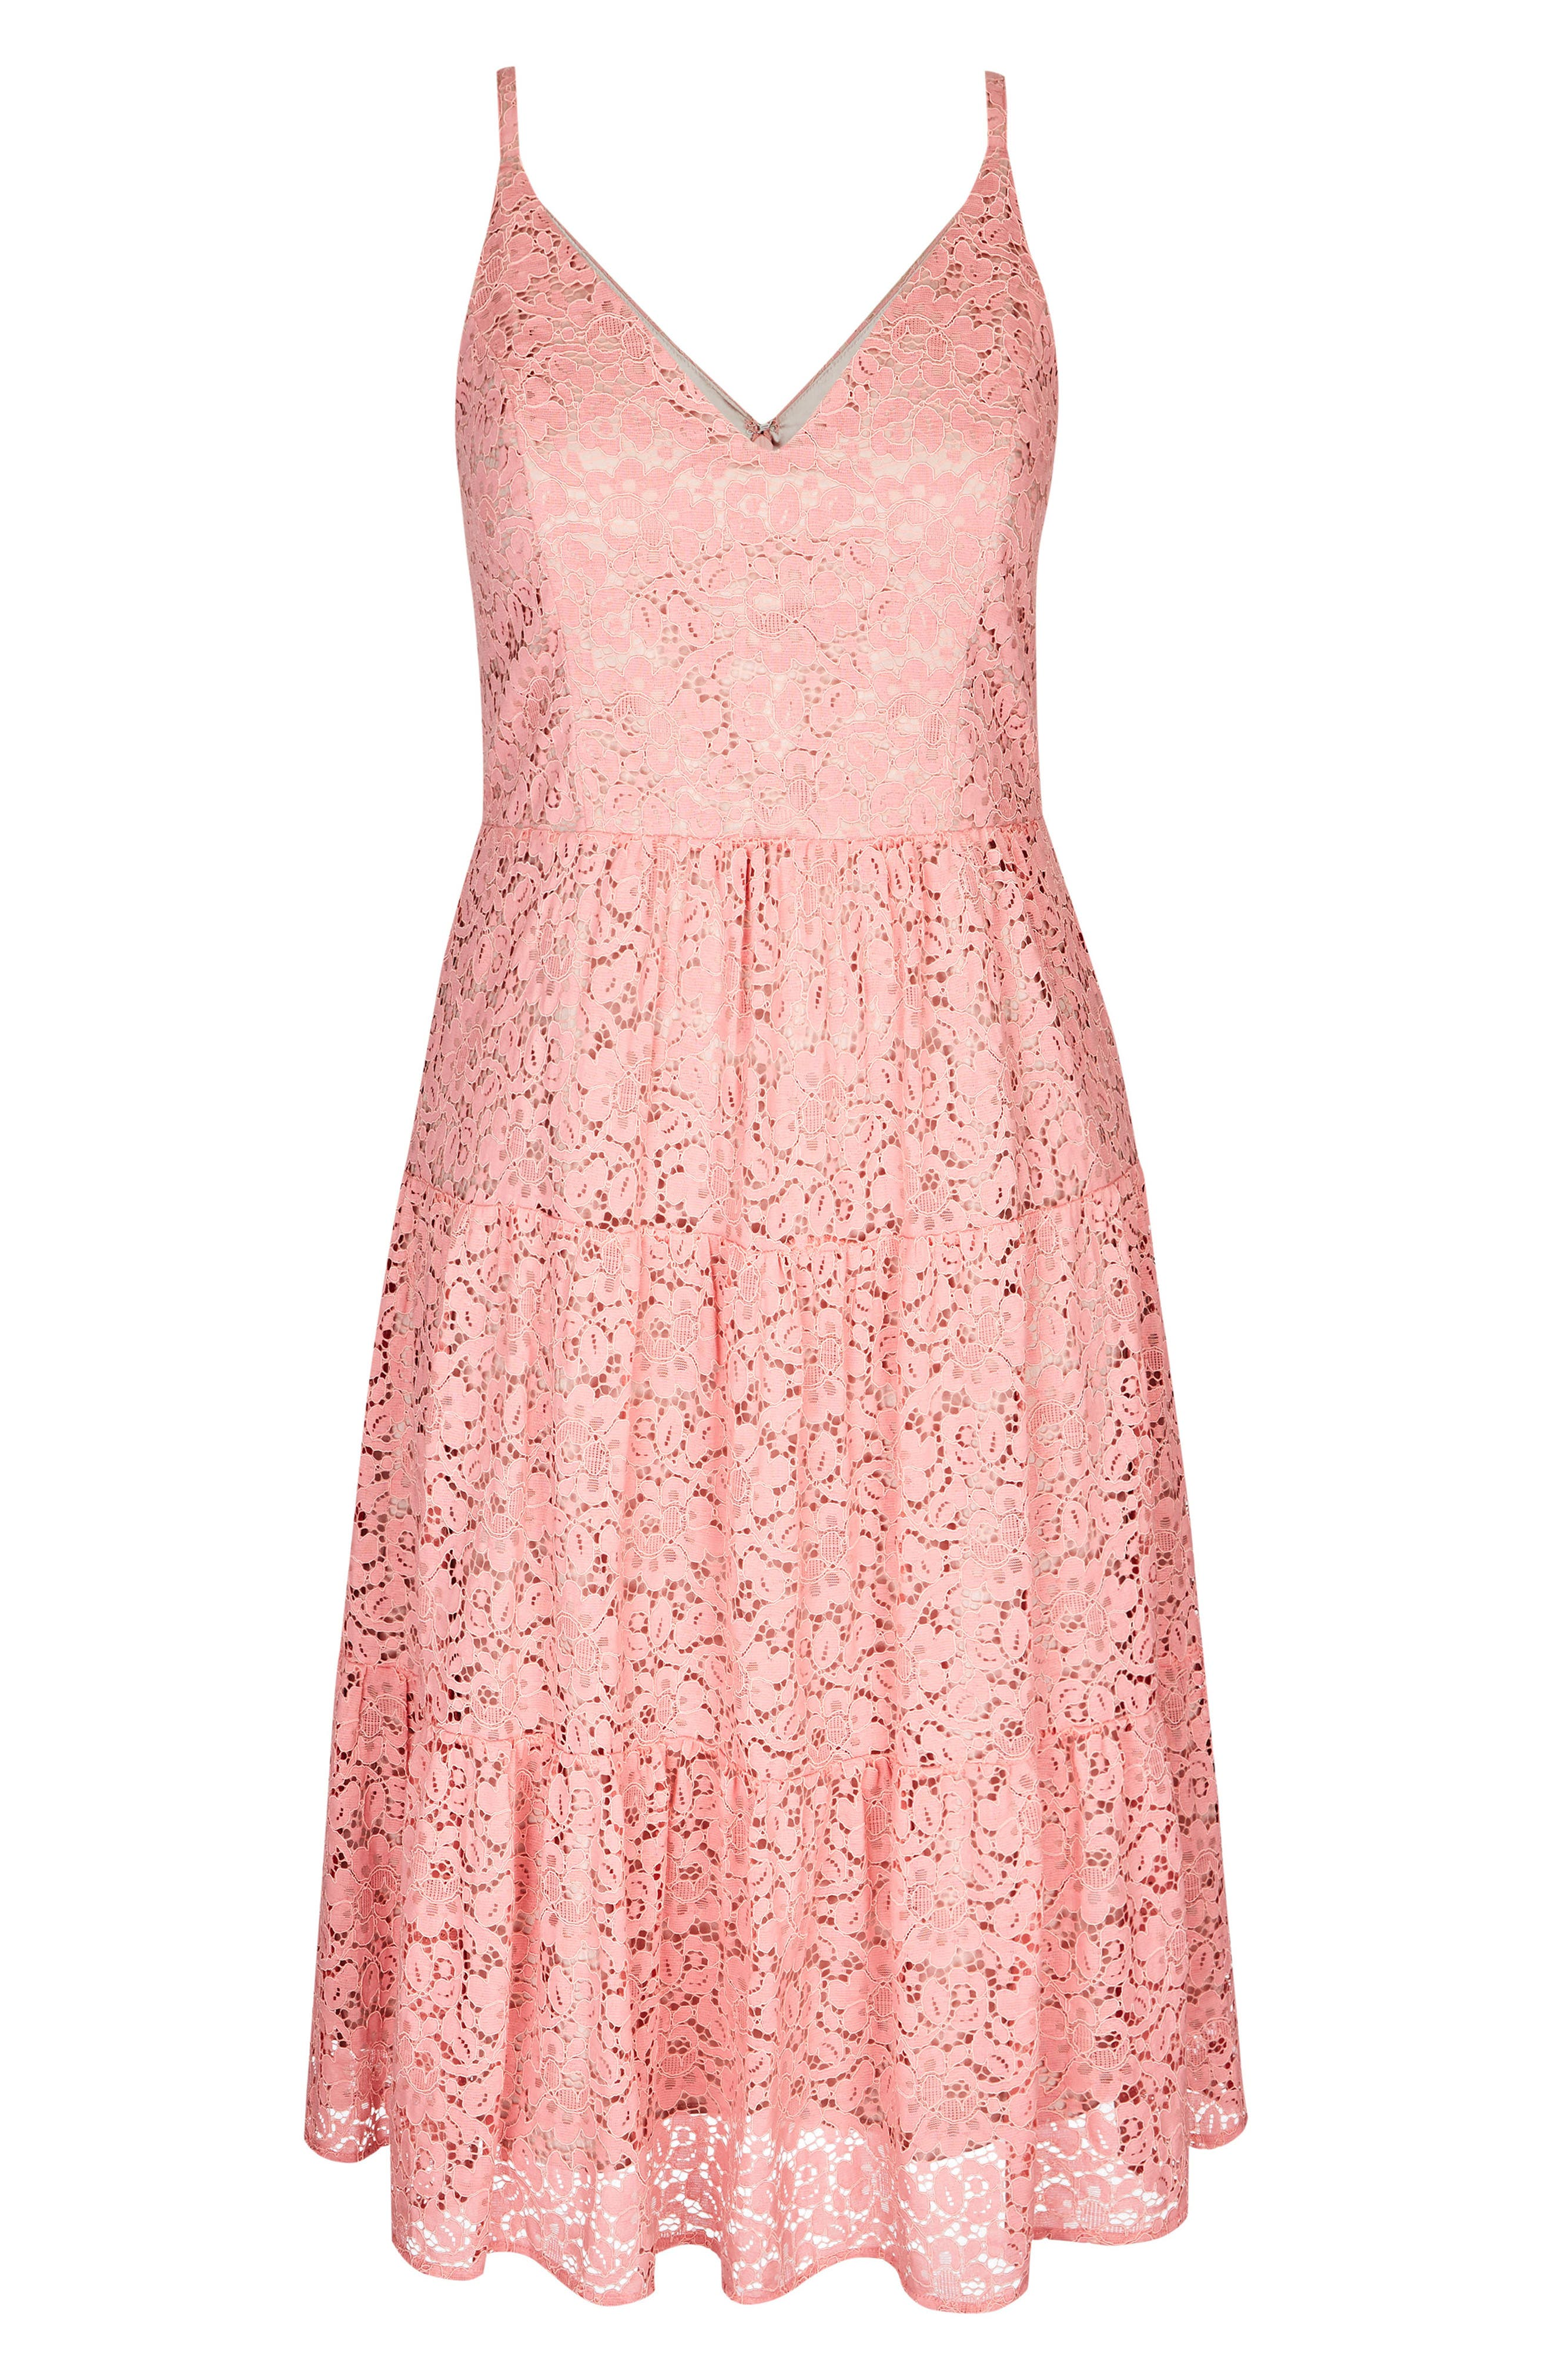 Sweet Kiss Dress,                             Alternate thumbnail 3, color,                             Pout